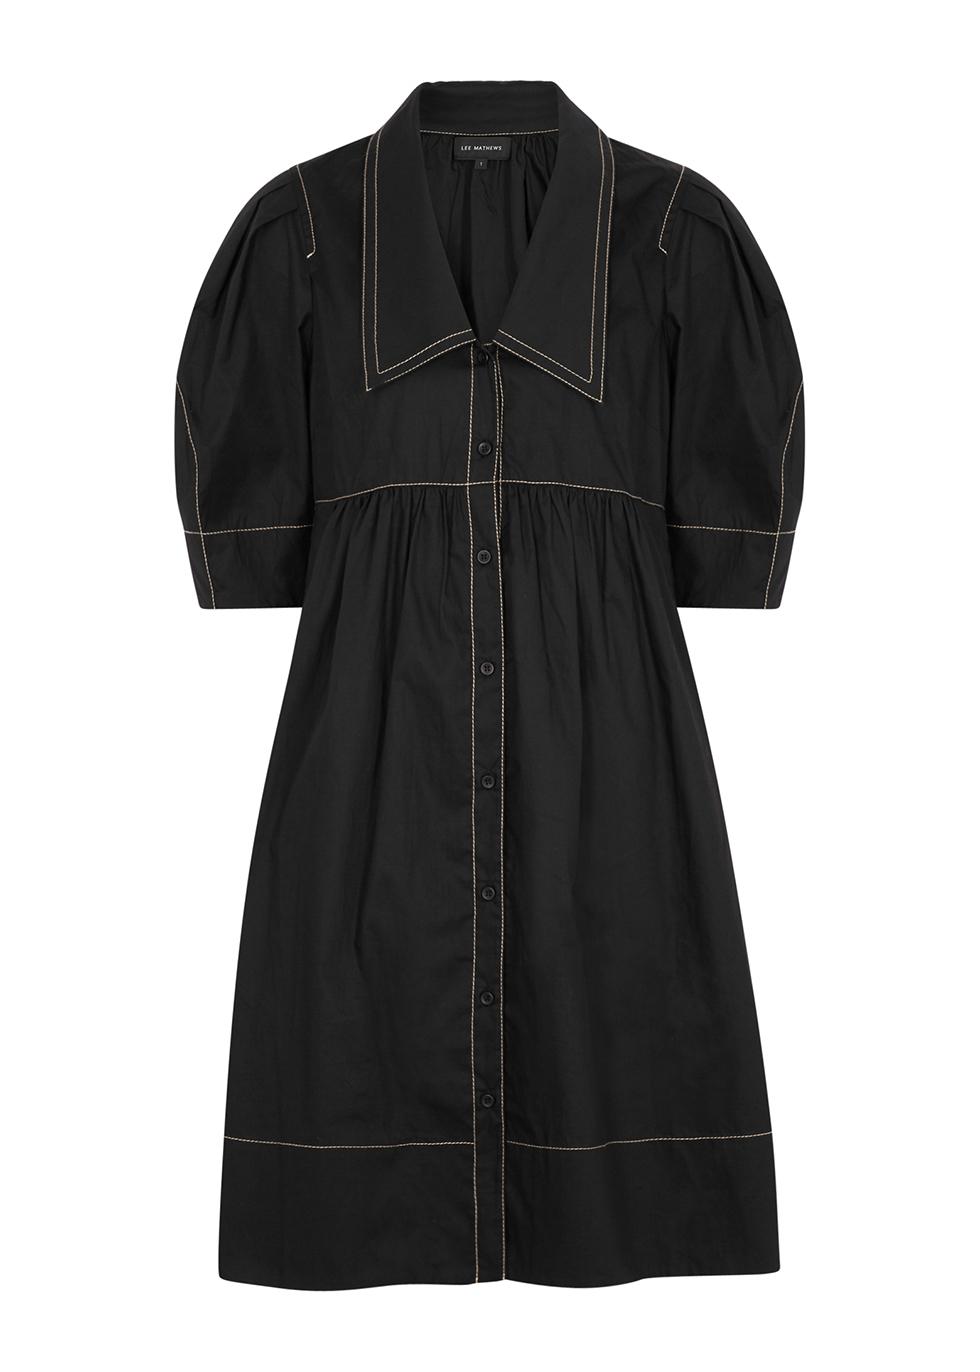 Nerissa black cotton shirt dress